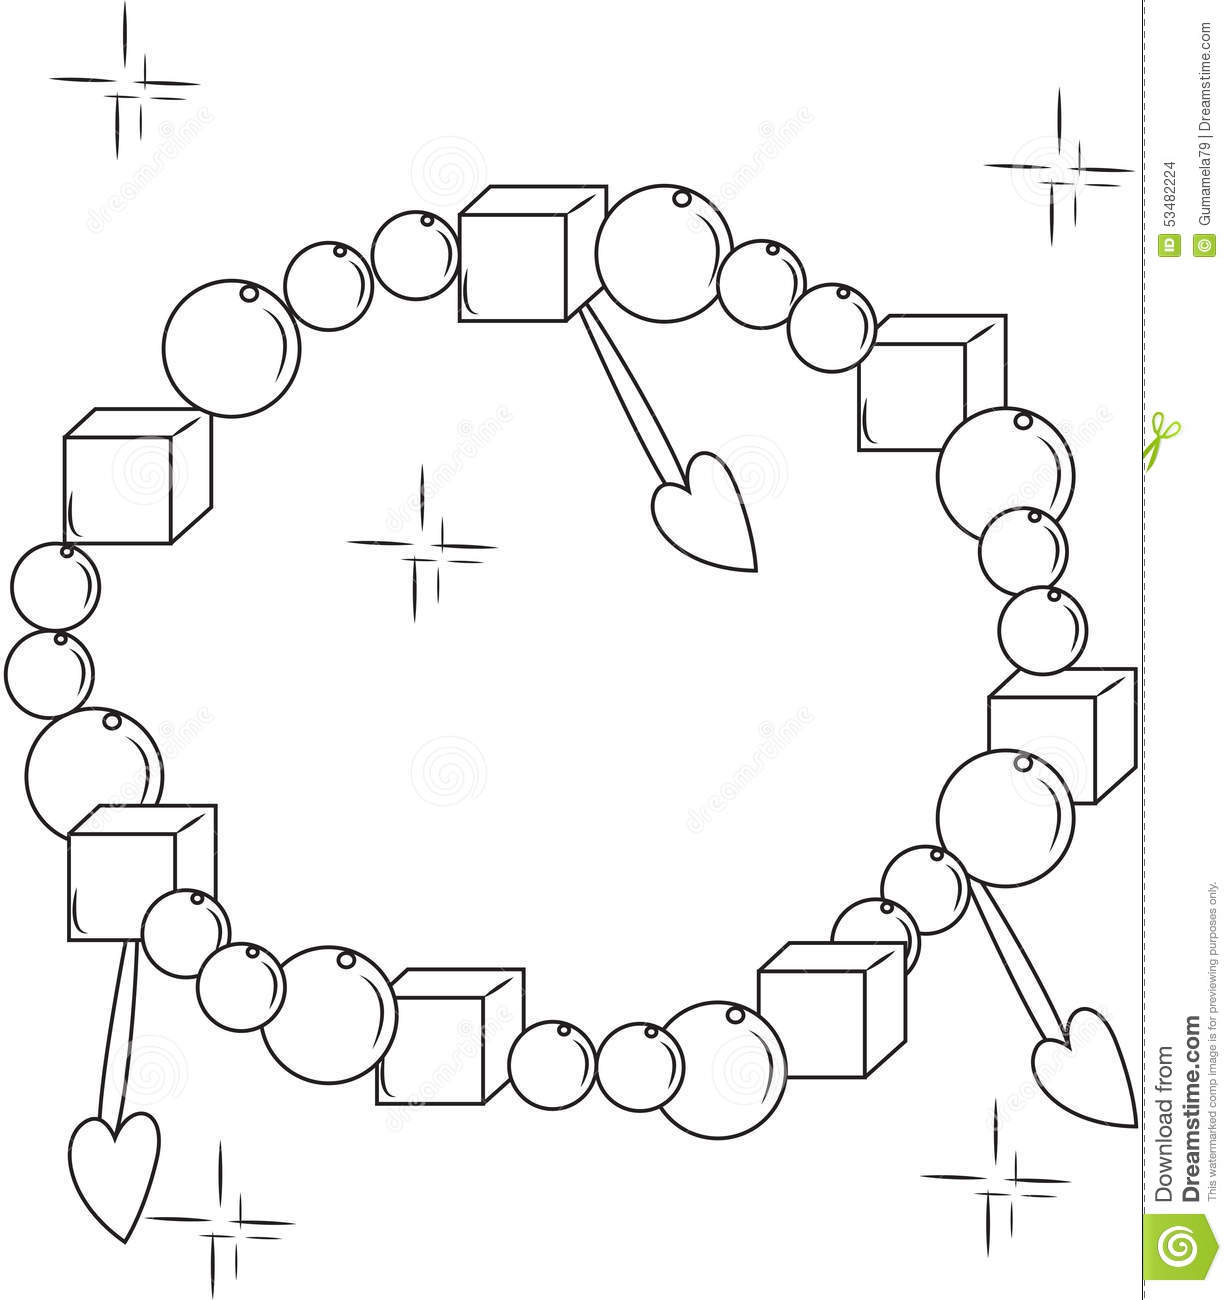 Bracelet coloring #19, Download drawings